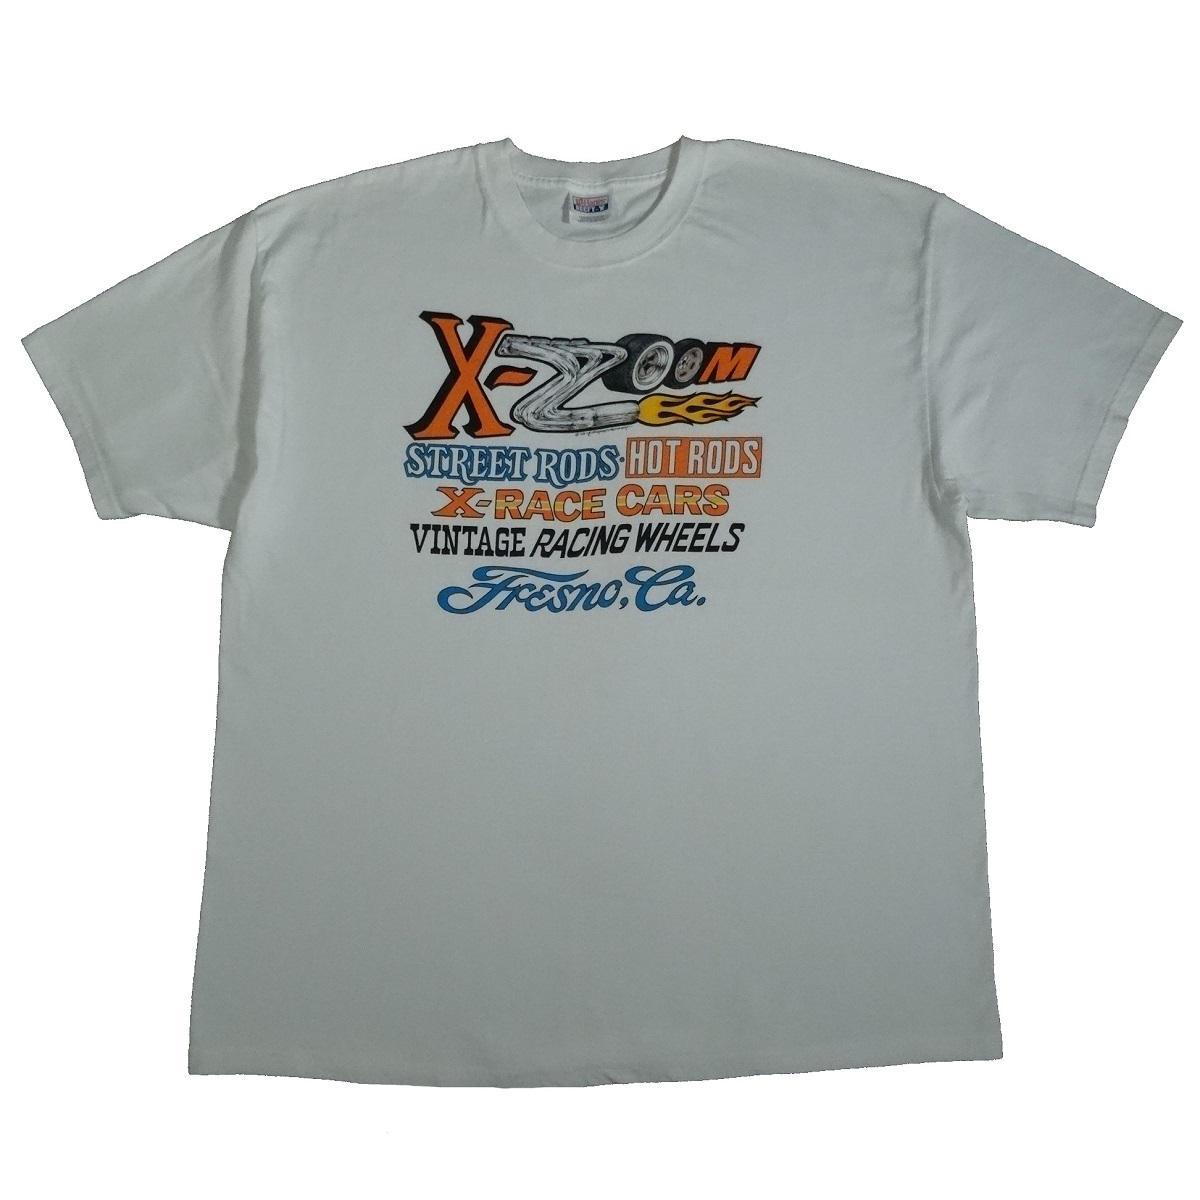 vintage racing wheels t shirt front of shirt